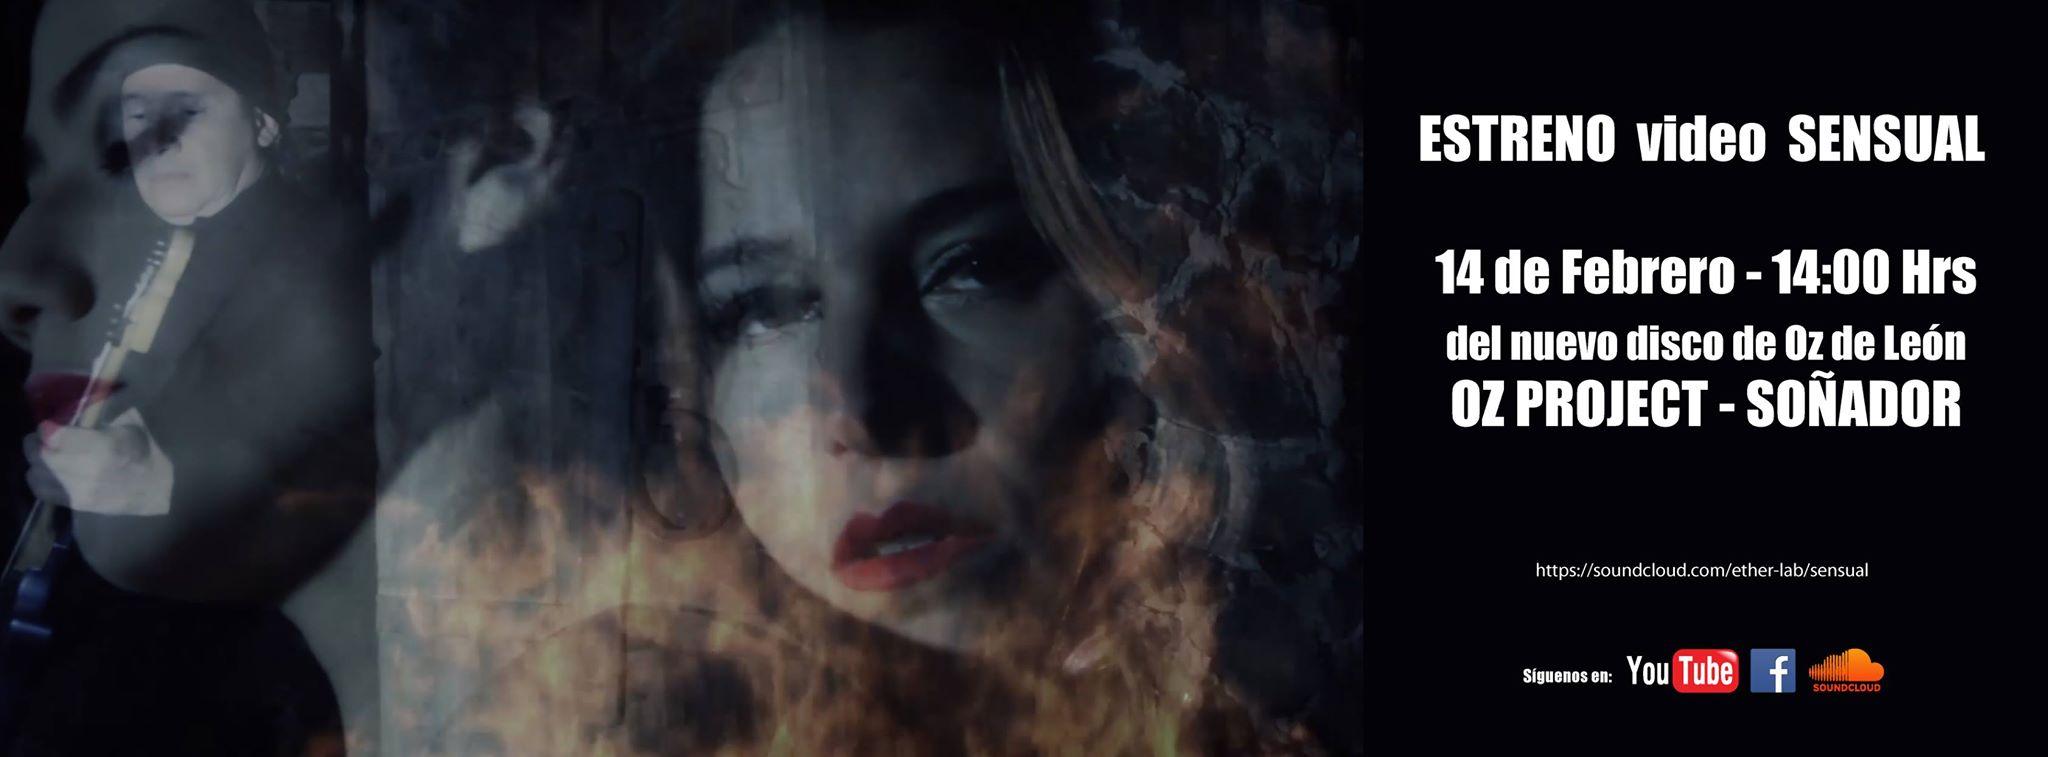 SENSUAL- ESTRENO VIDEO